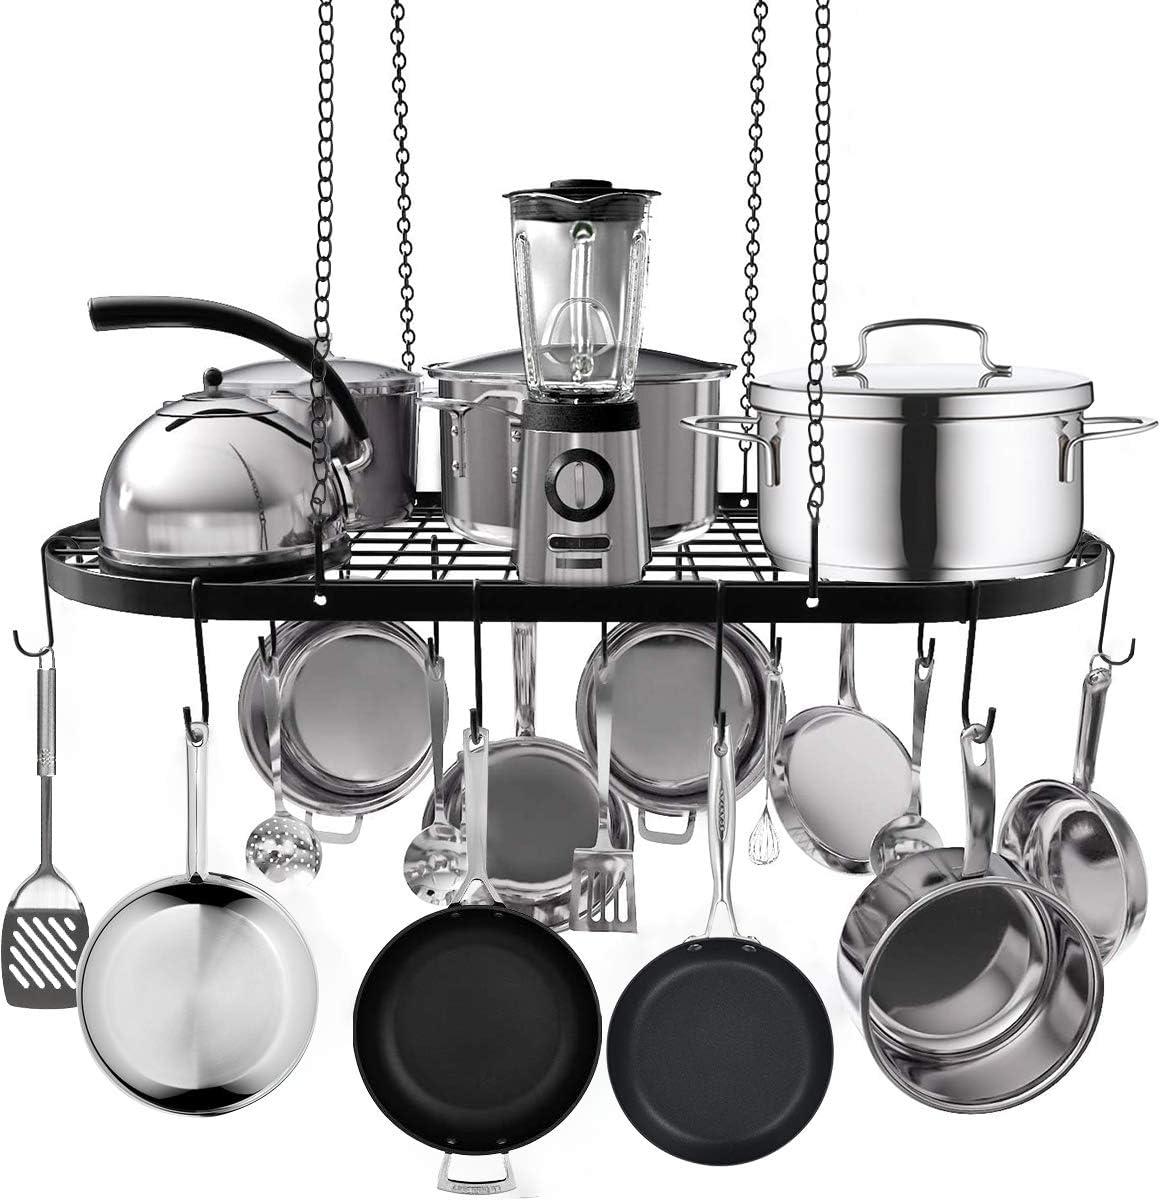 Hanging Pot and Pan Rack Ranking TOP12 Hanger store Ceiling Mount Cookware